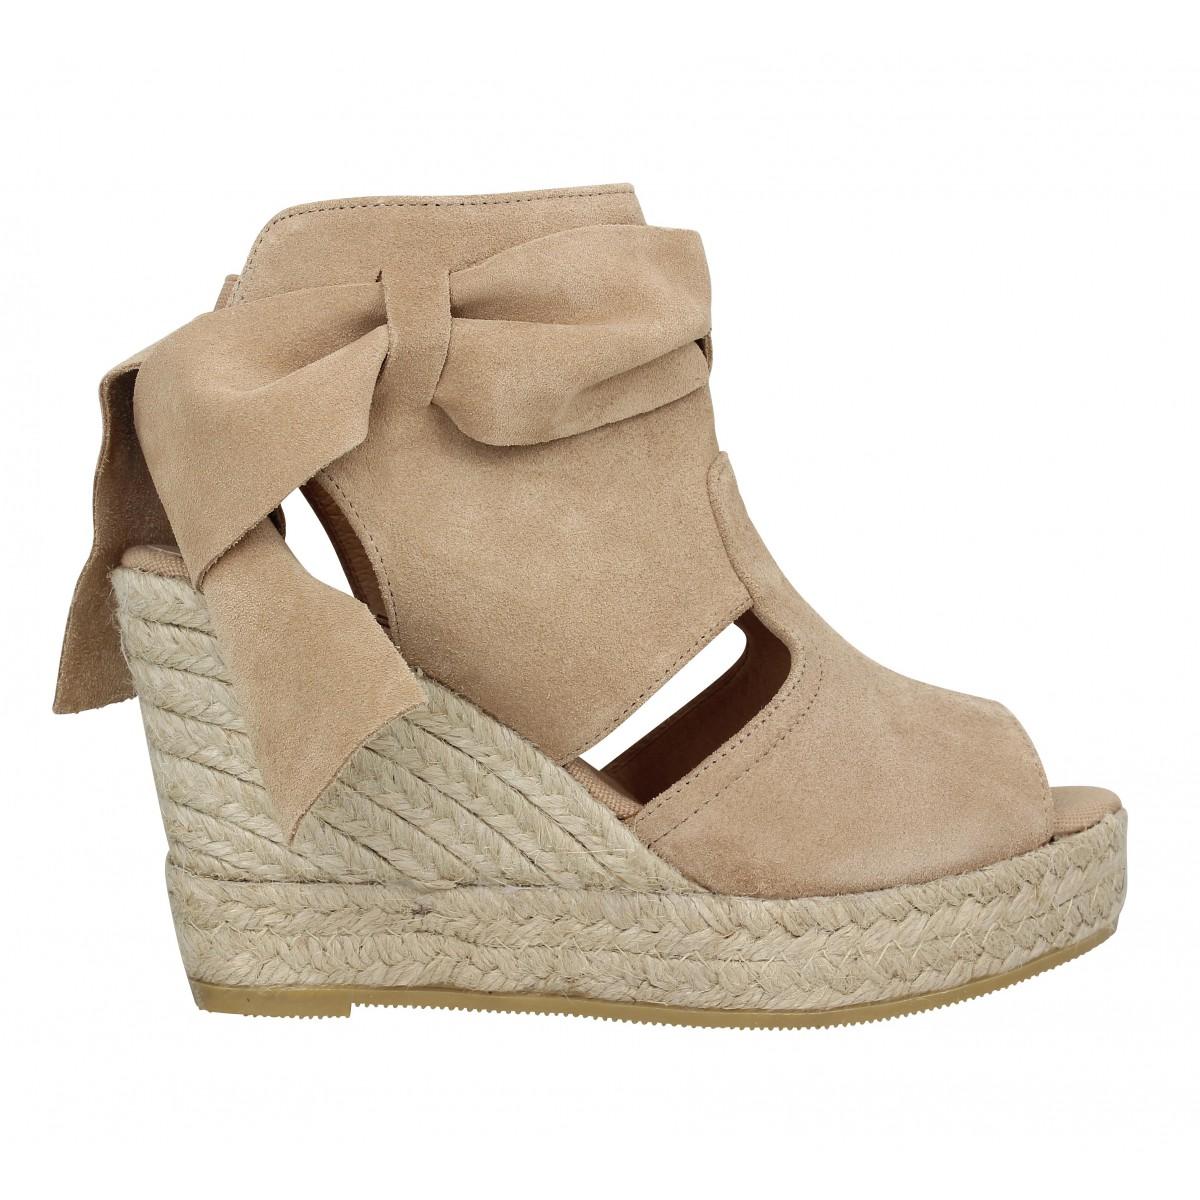 Kanna Chaussures Sandales Beige Femme 40 Taupe qrqkiH0wJ